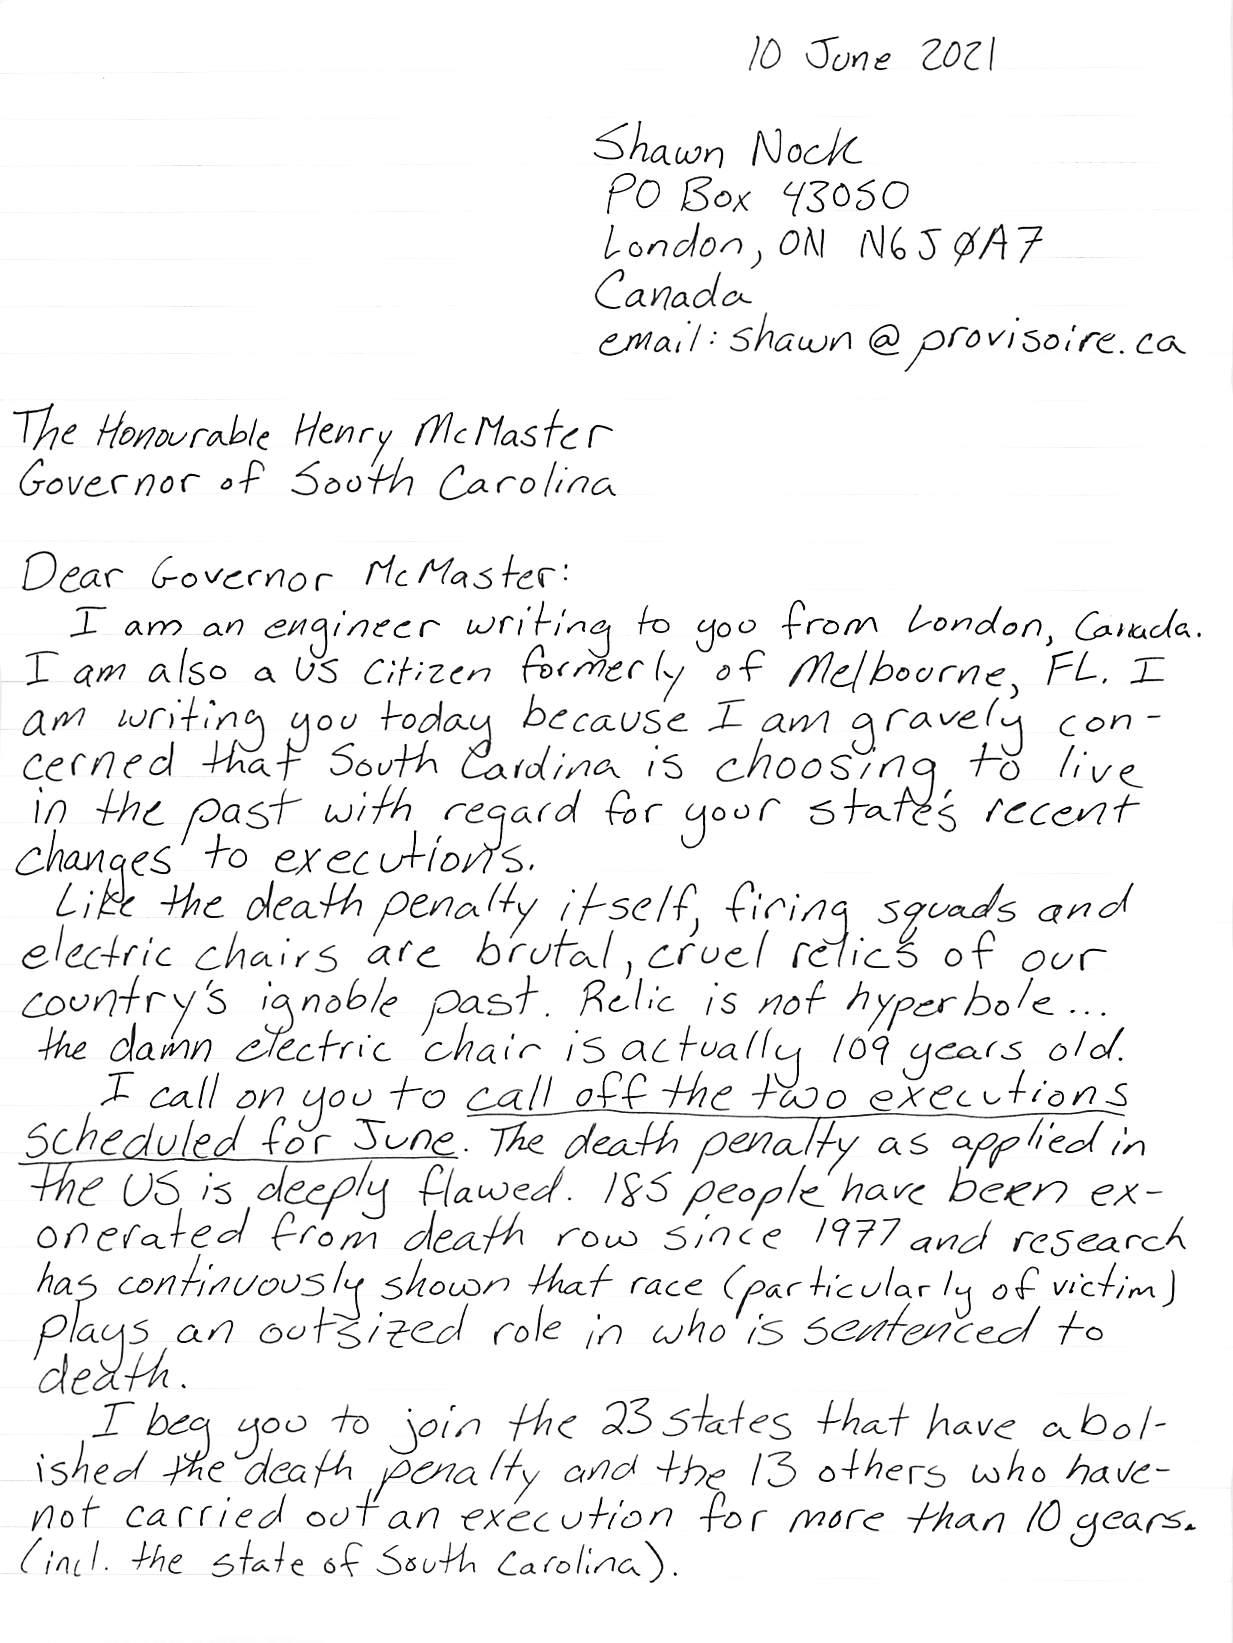 handwritten letter, page 1, transcript follows